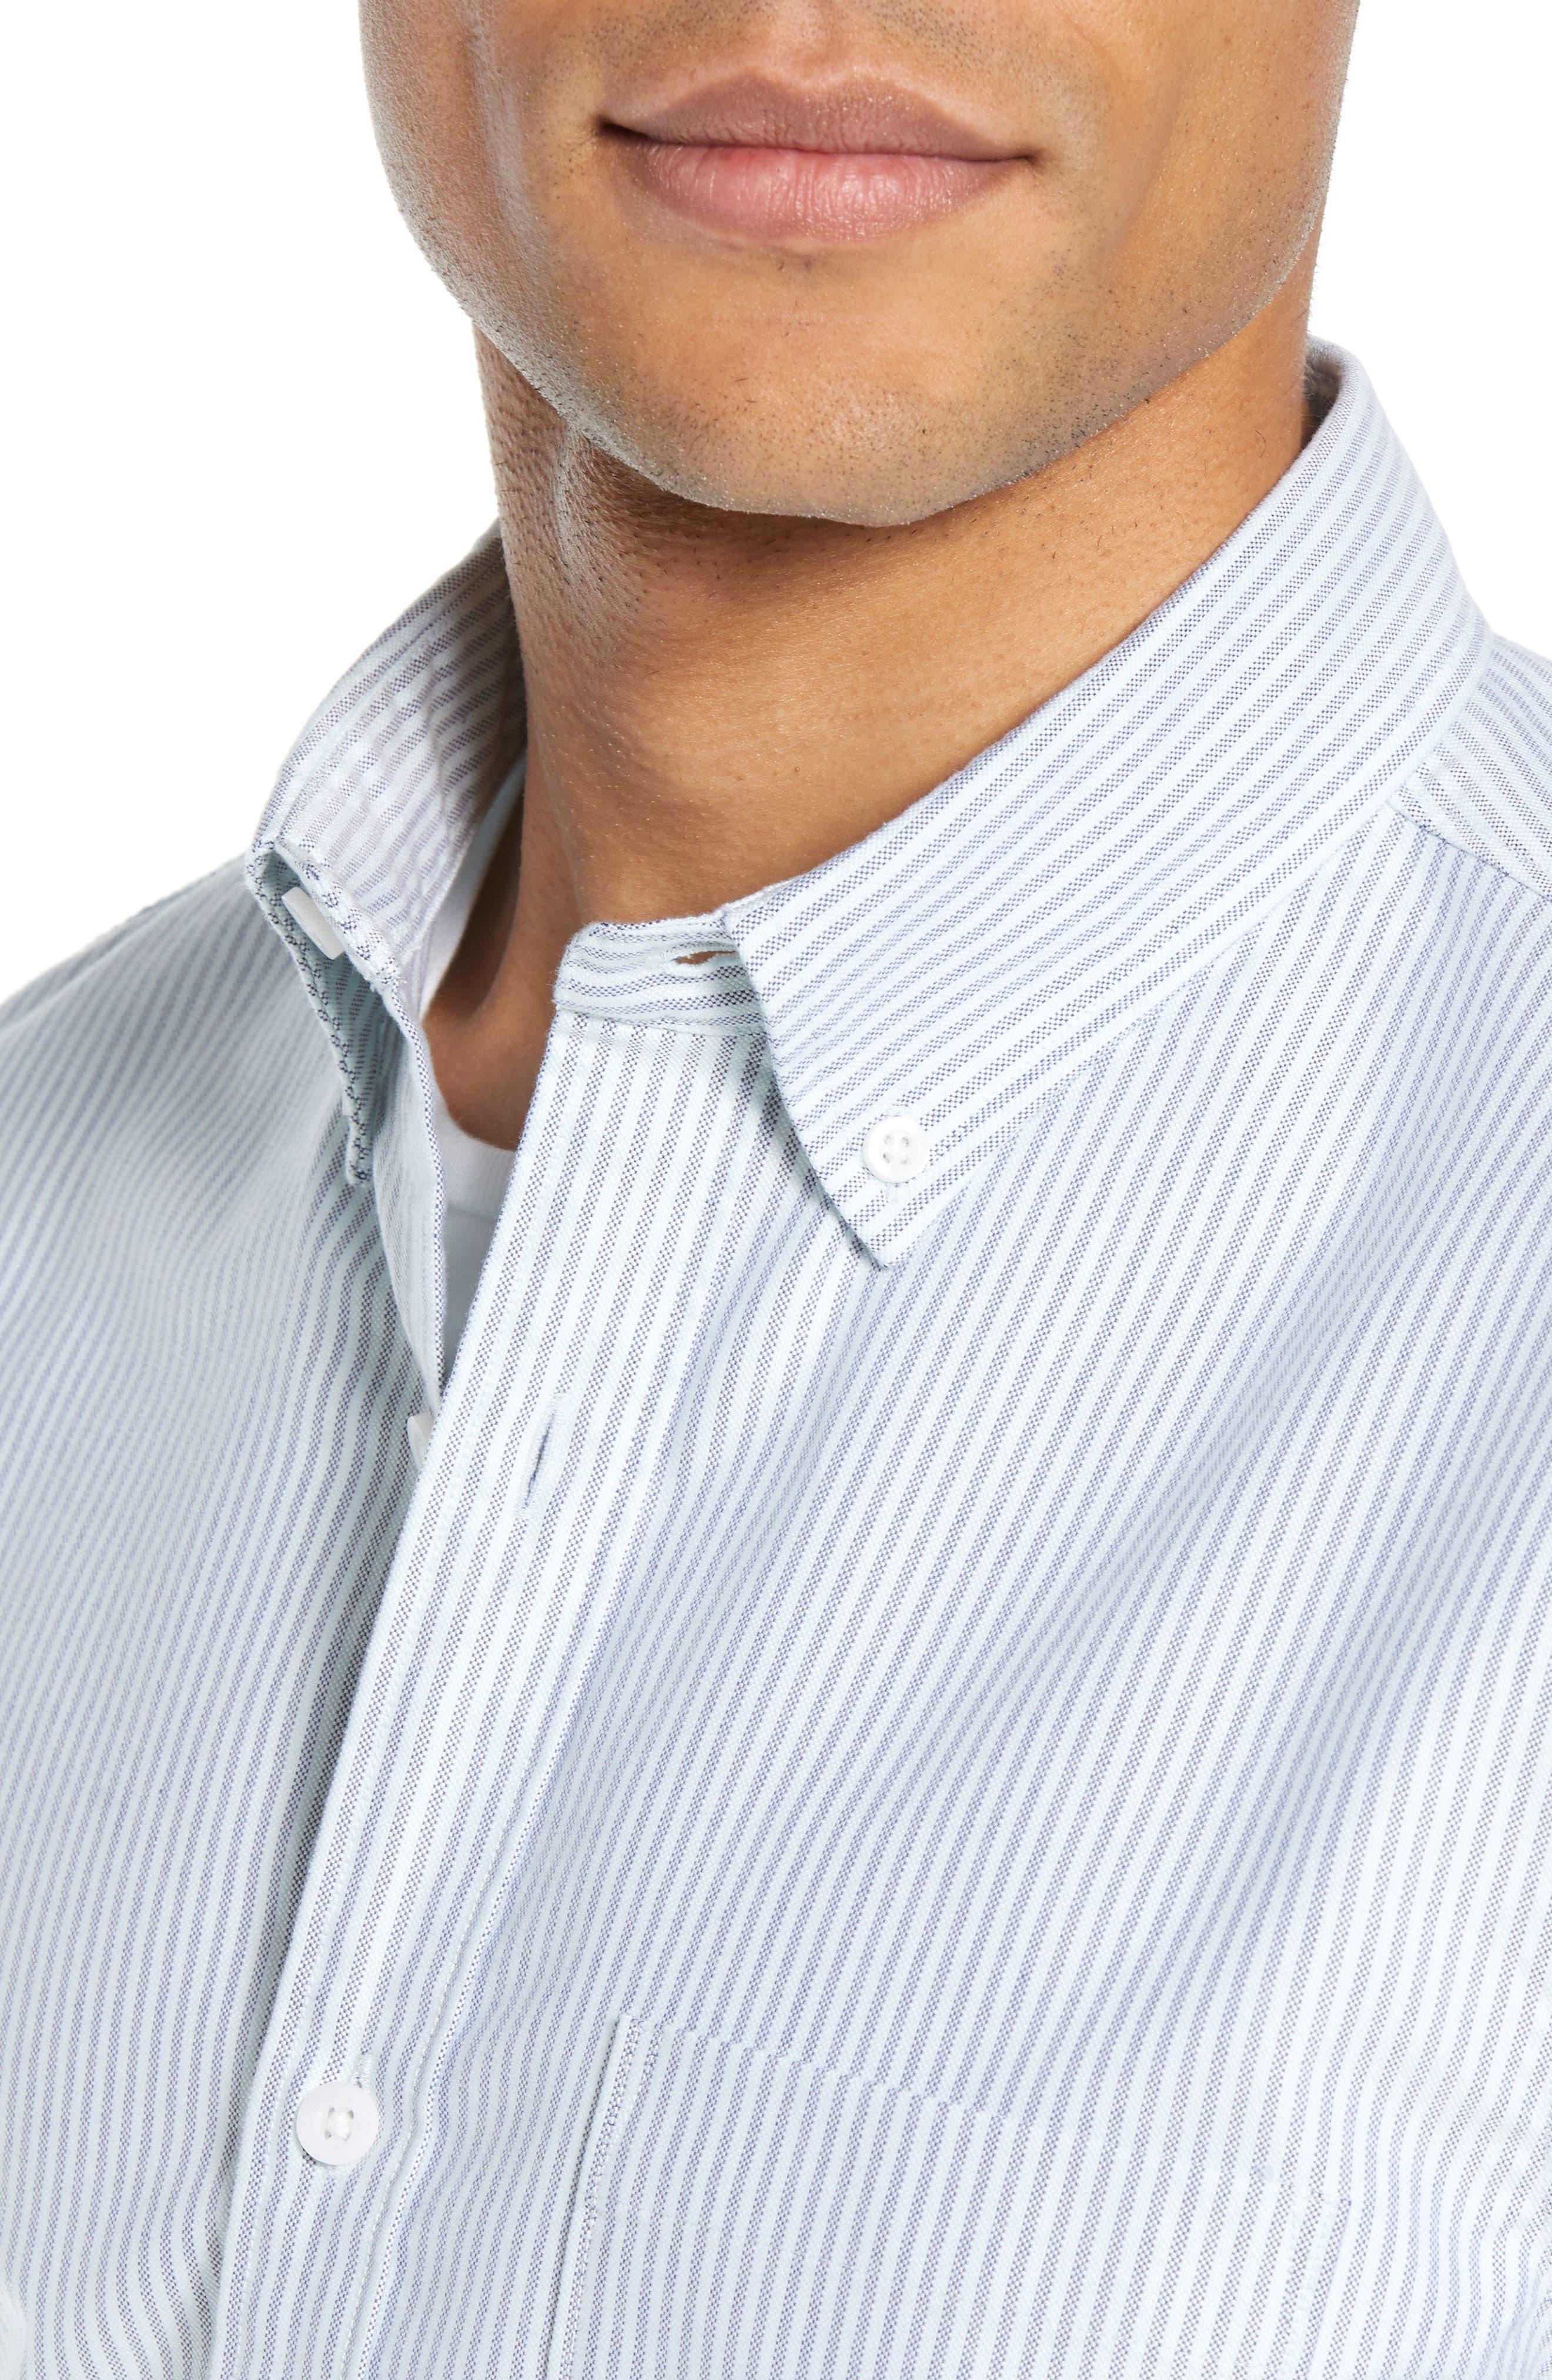 Trim Fit Bengal Stripe Sport Shirt,                             Alternate thumbnail 2, color,                             BLUE ENSIGN MINT STRIPE